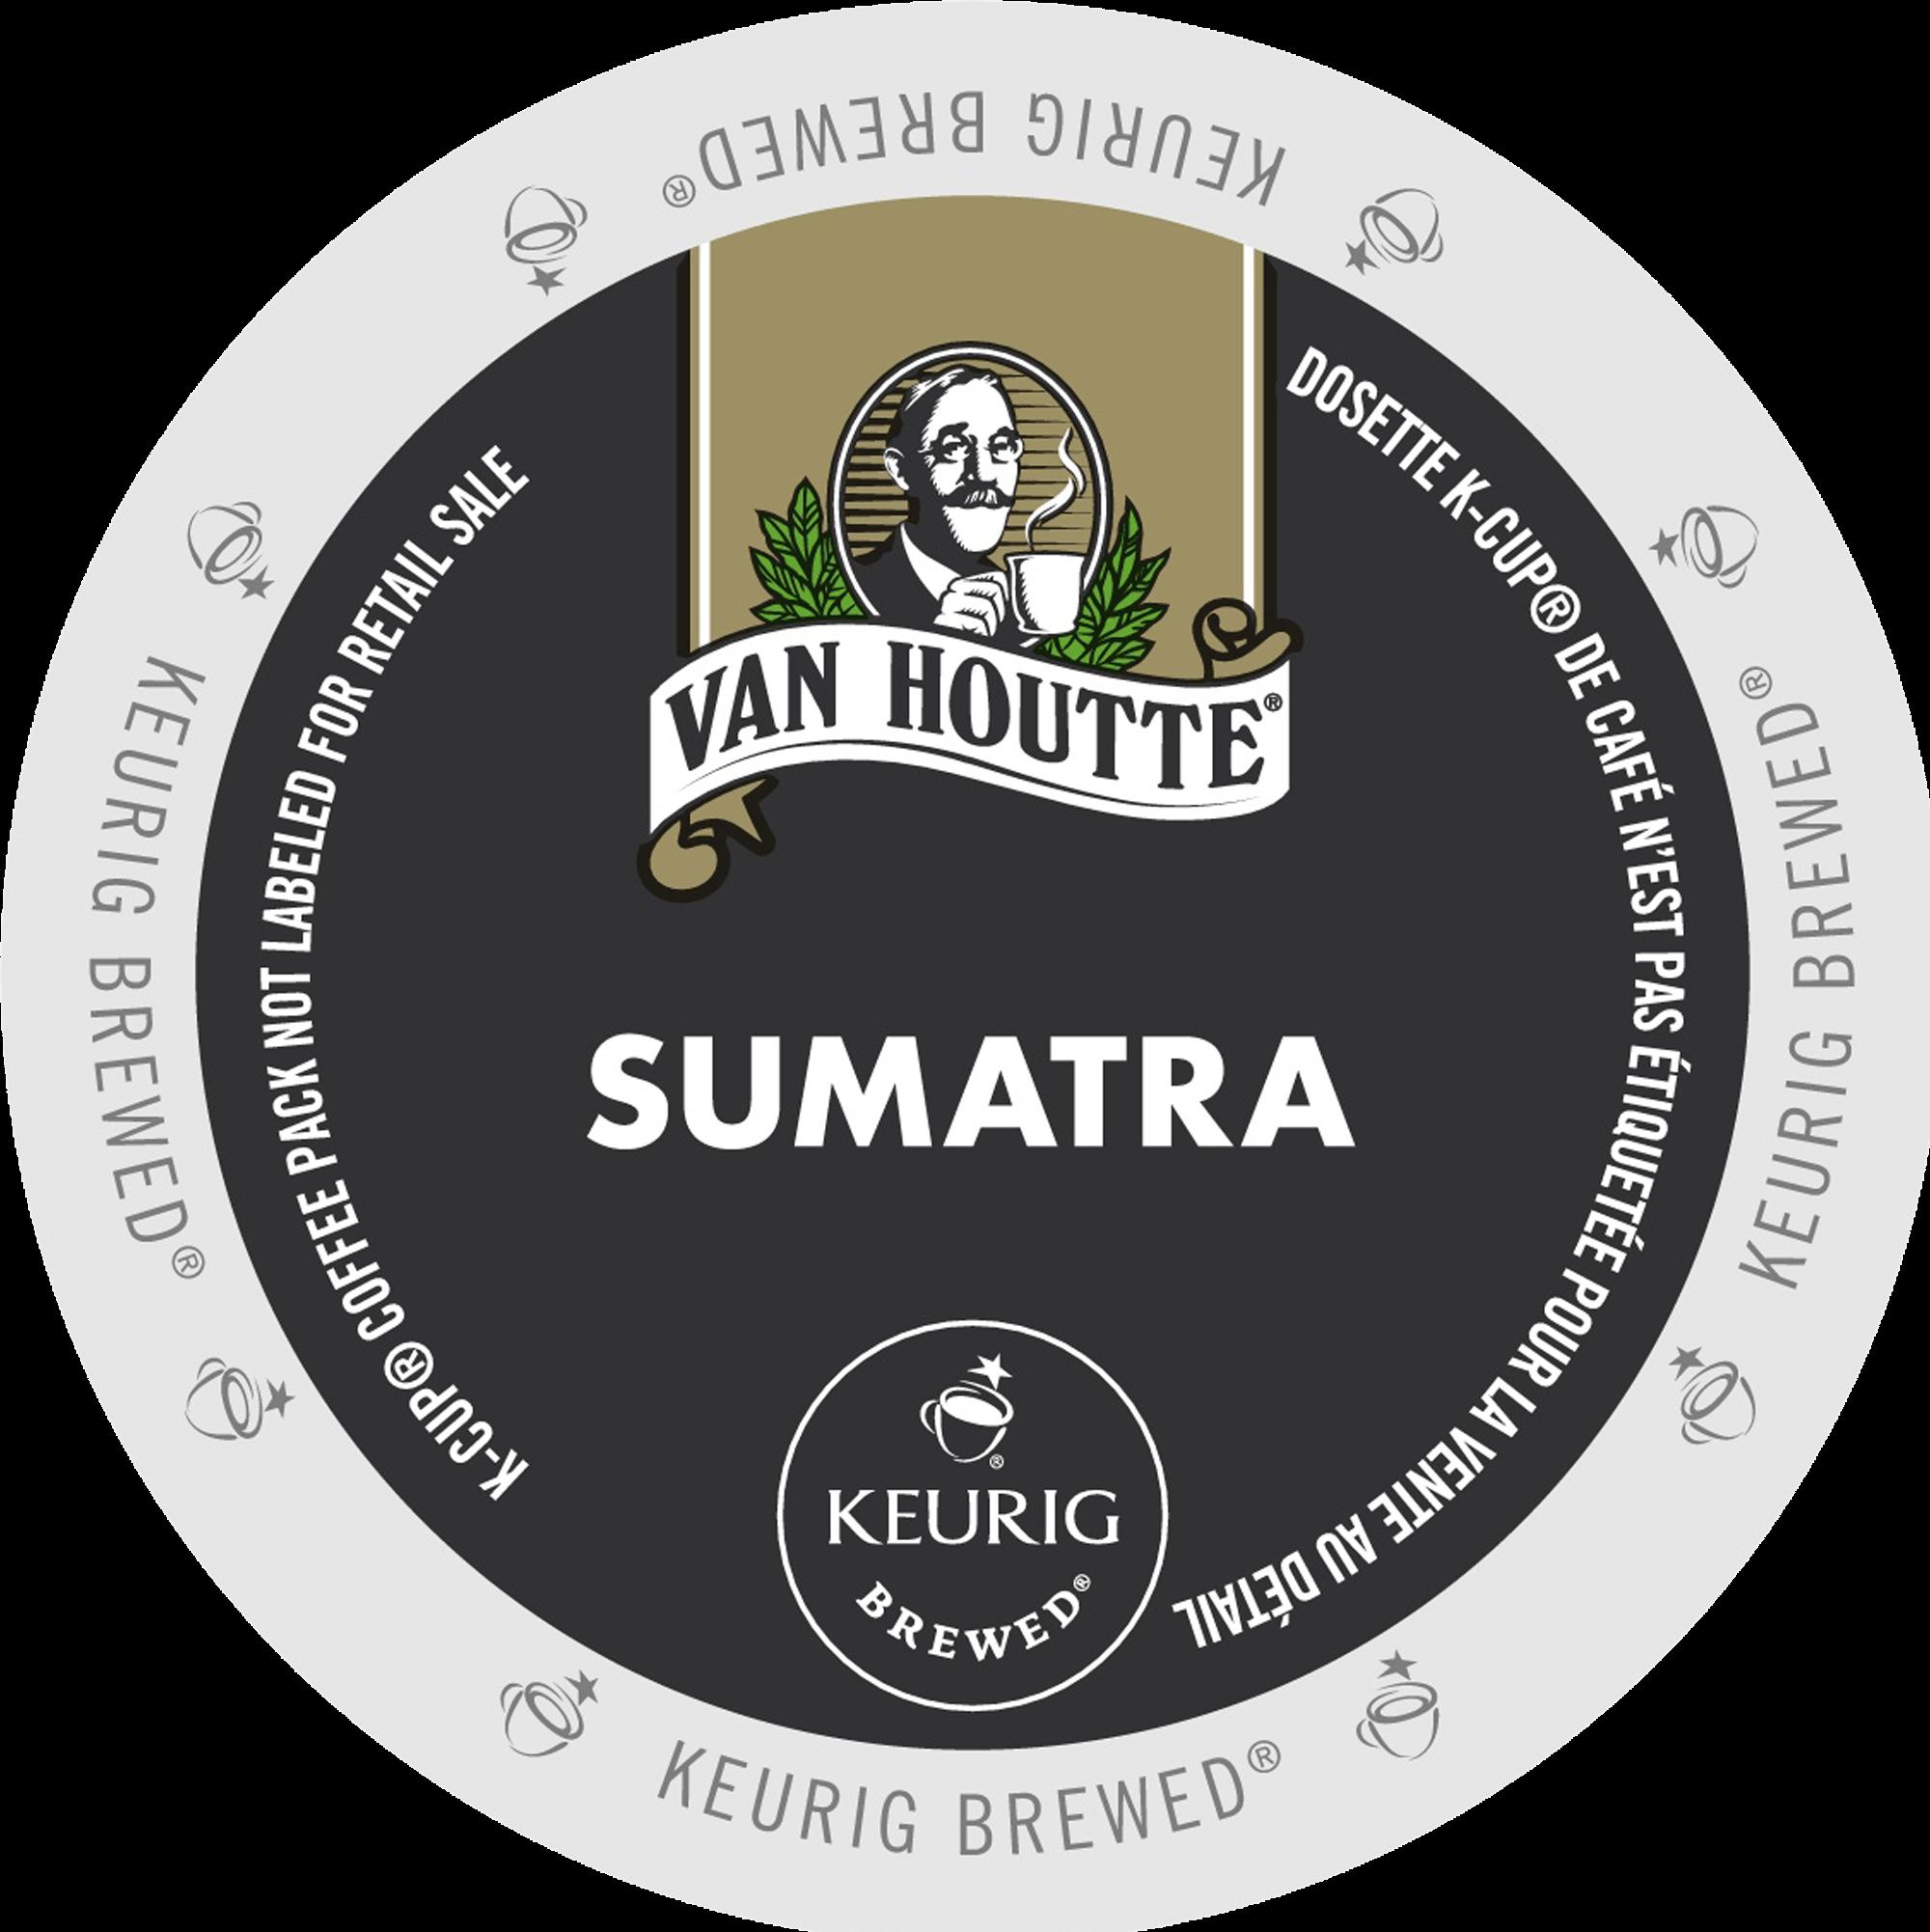 sumatra-fair-trade-coffee-van-houtte-k-cup_ca_general